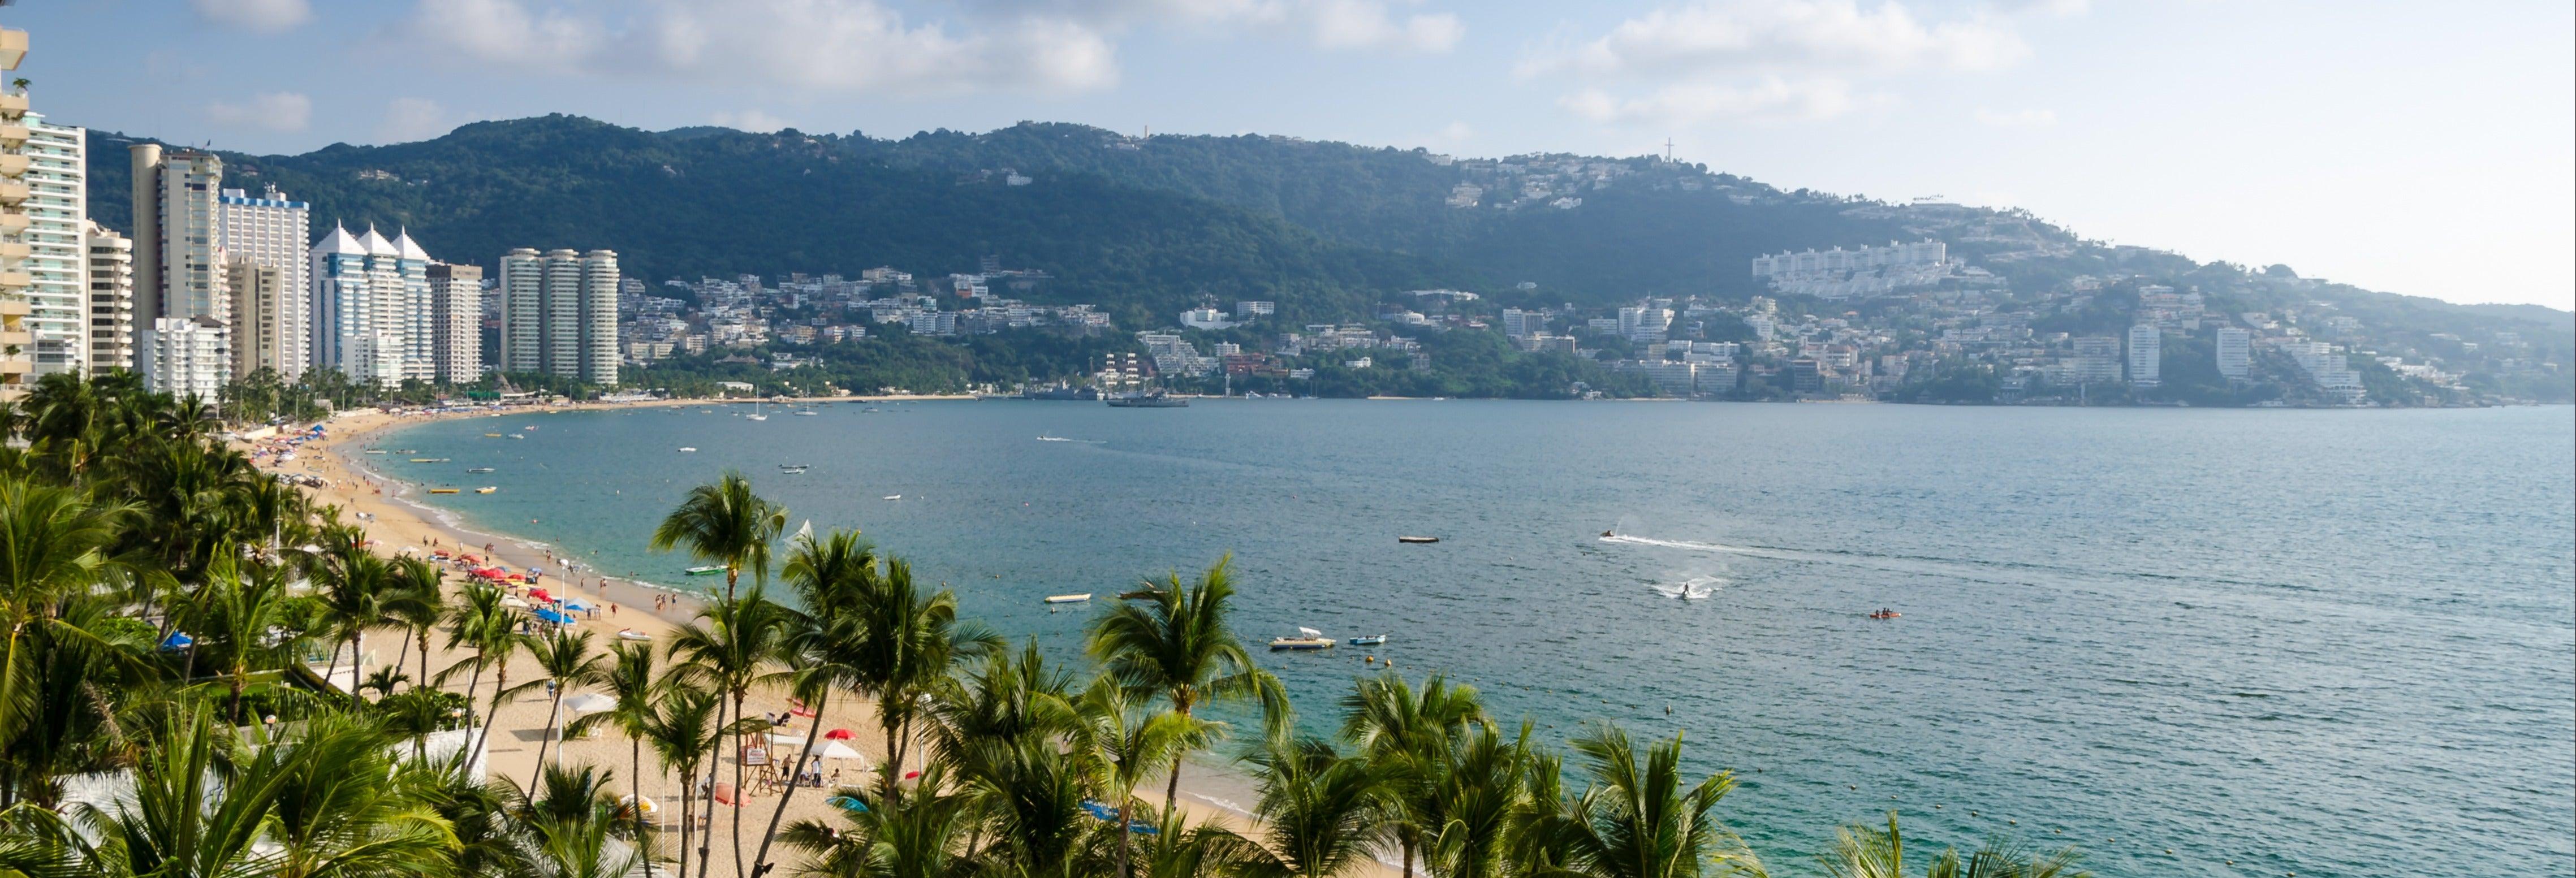 Visita guidata di Acapulco